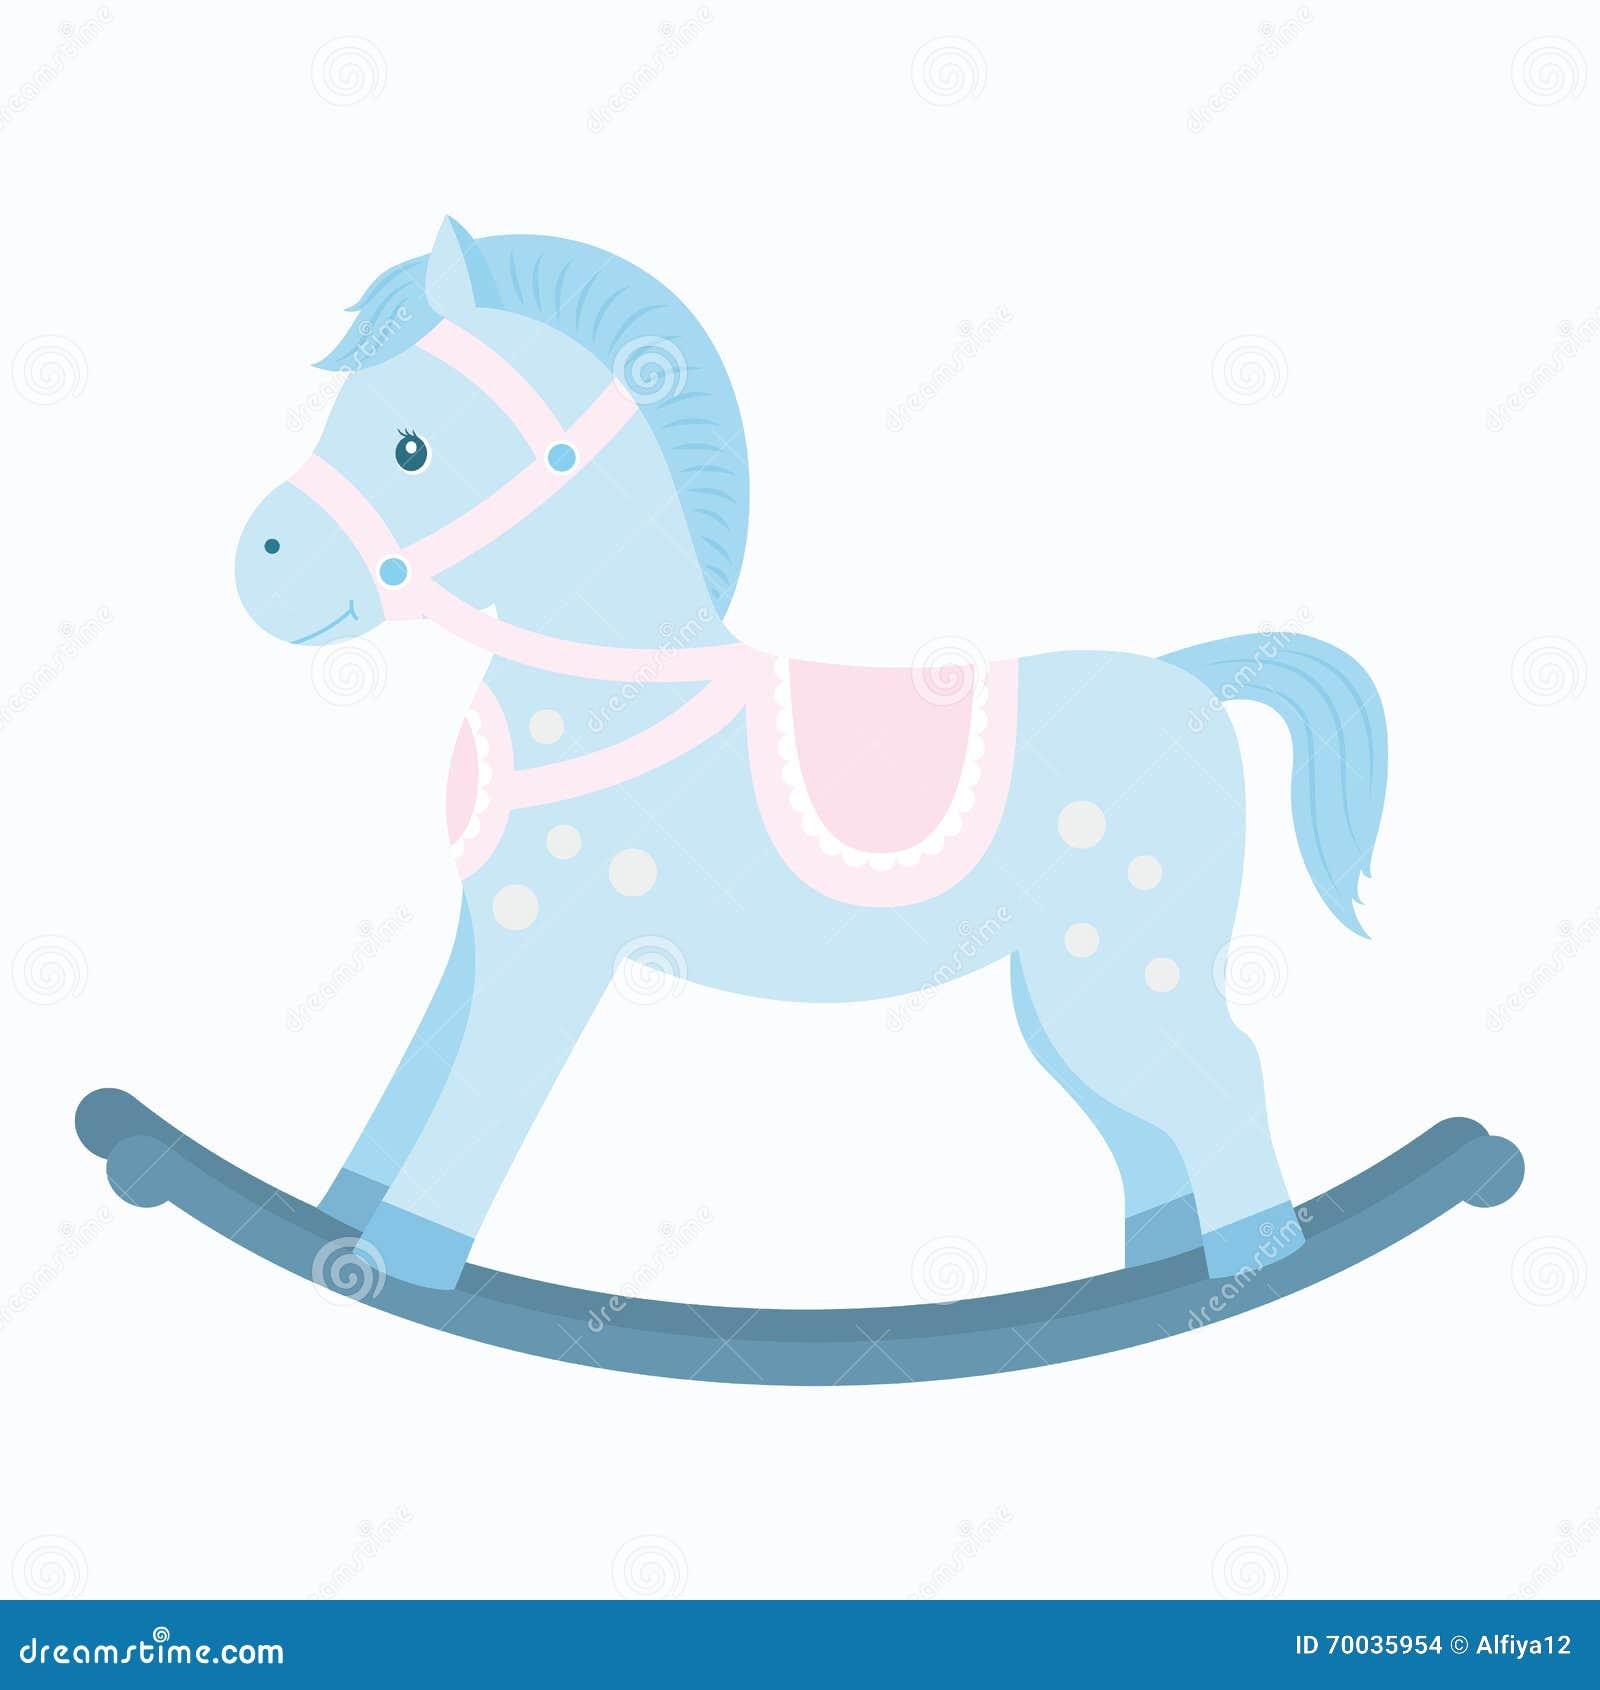 Rocking Horse Stock Vector Illustration Of Vector Decoration 70035954